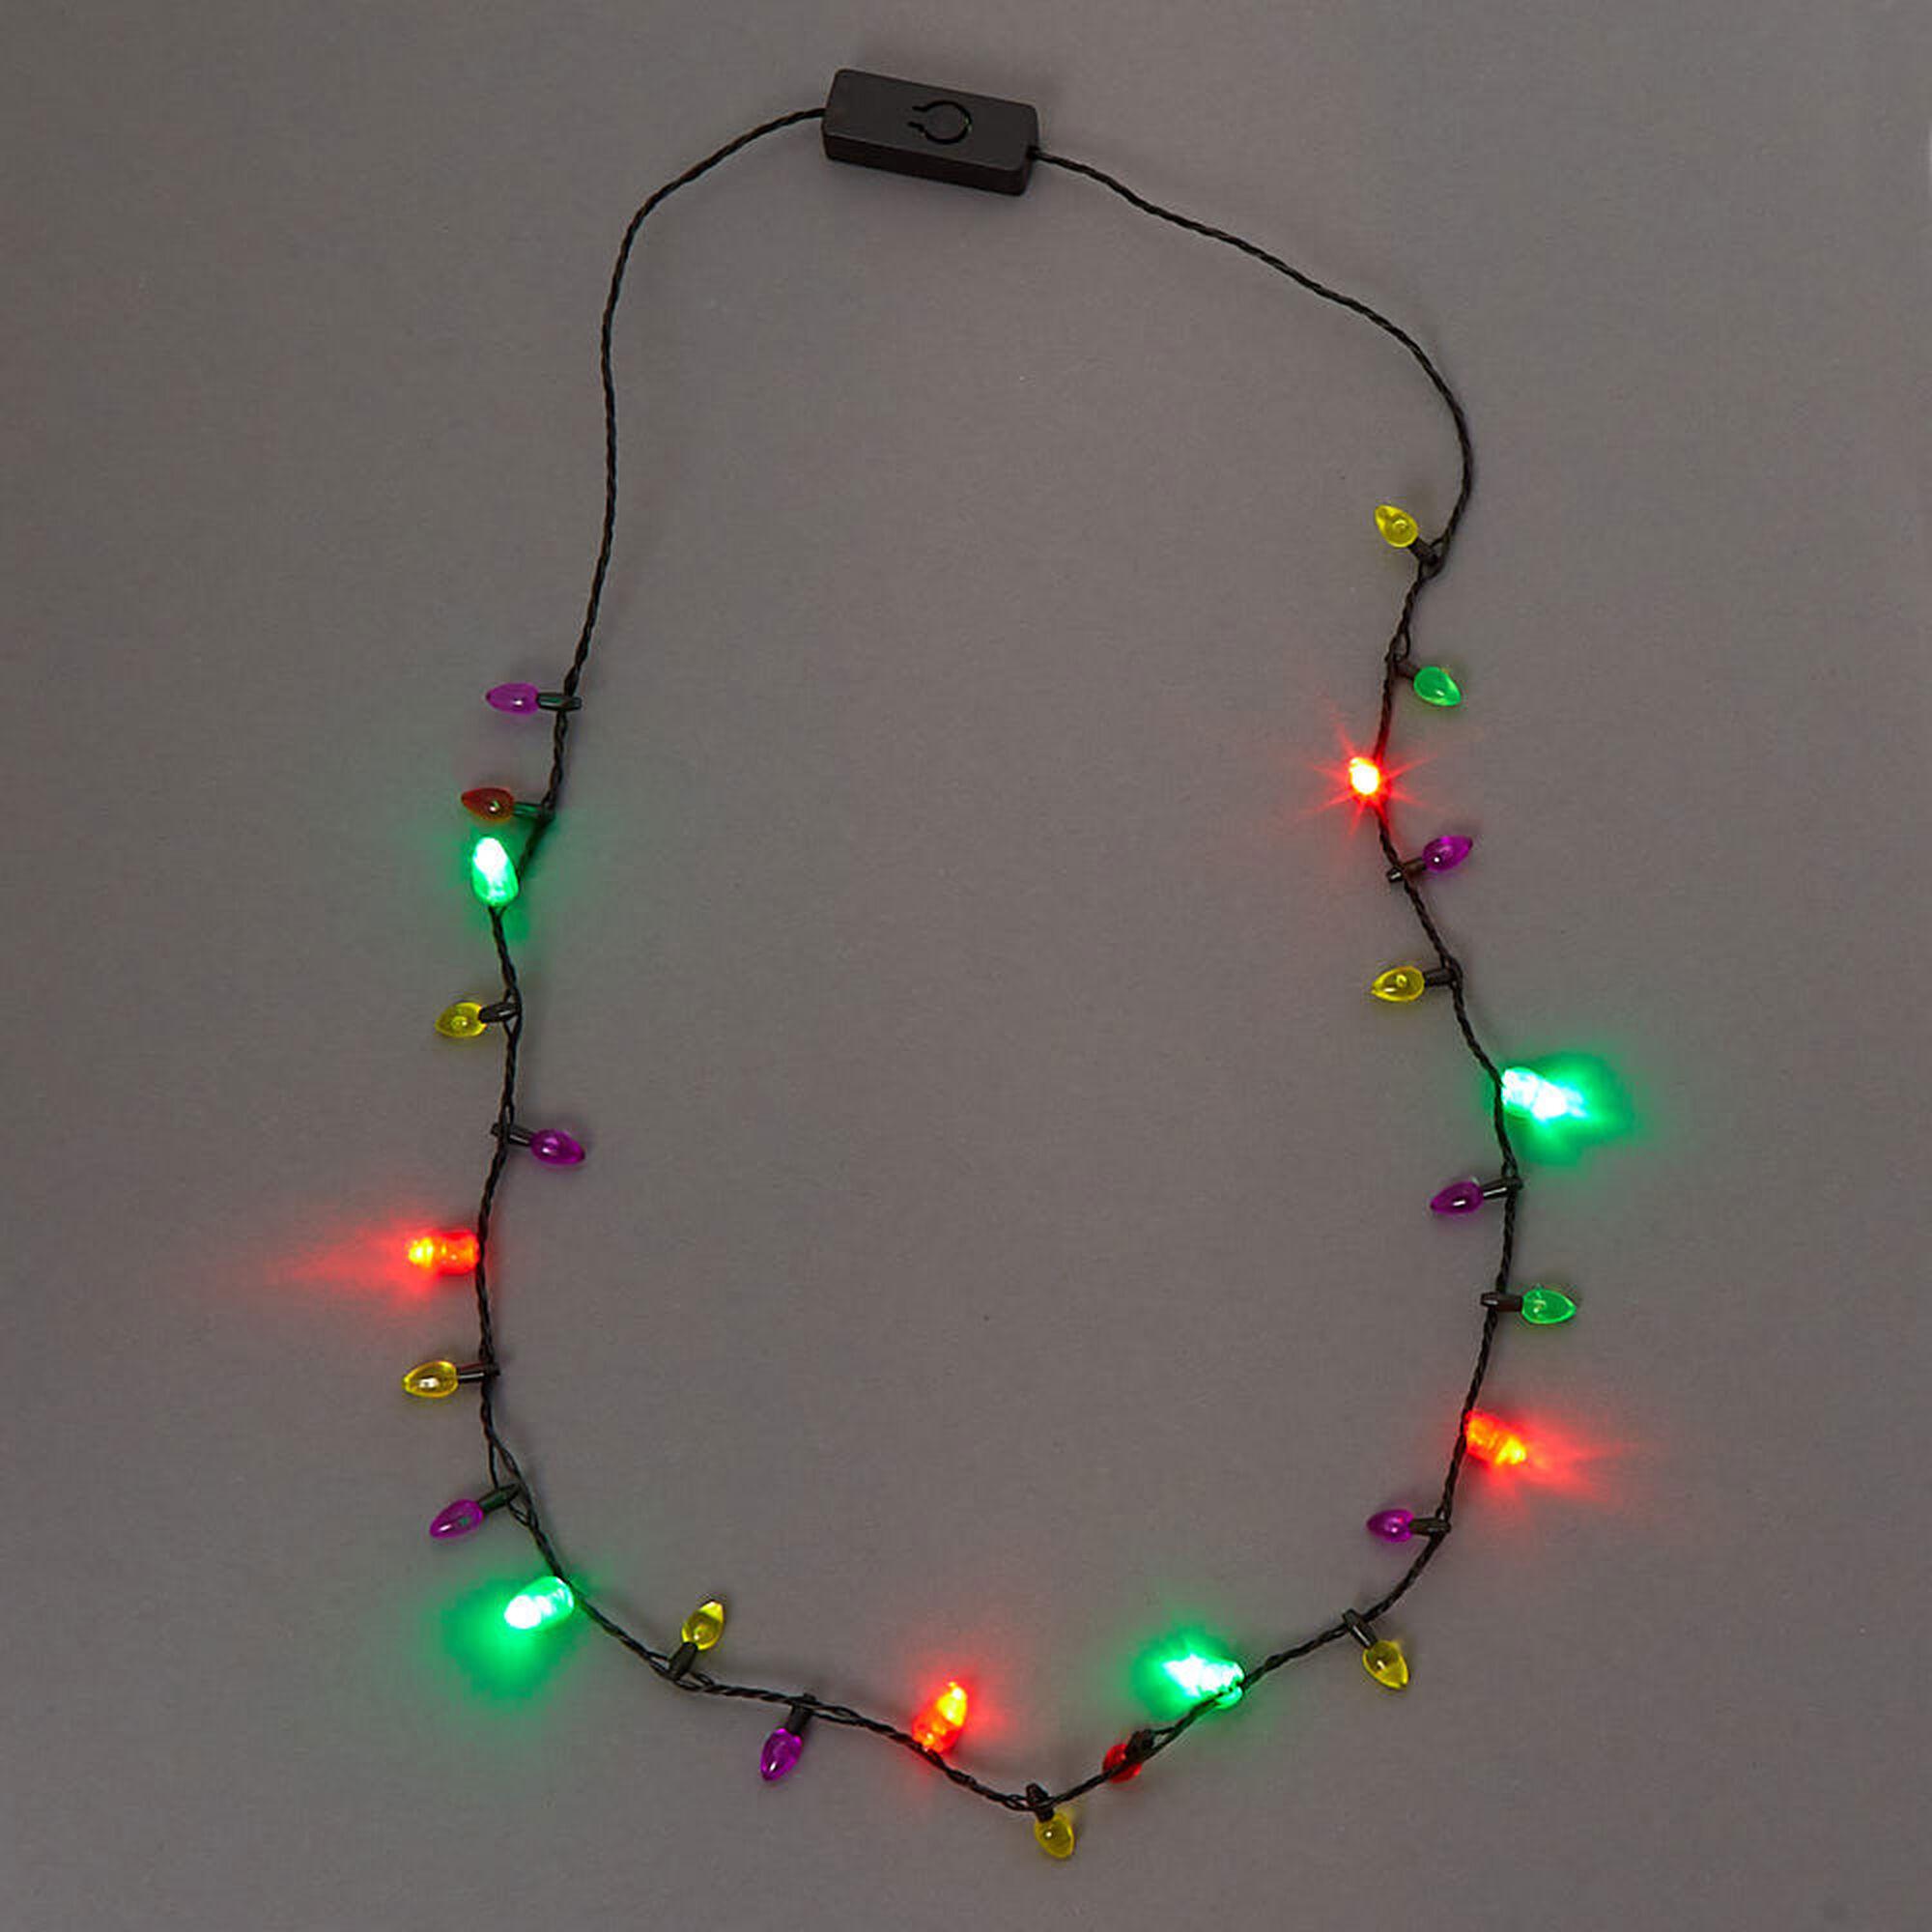 Mini Christmas Lights Light Up Necklace